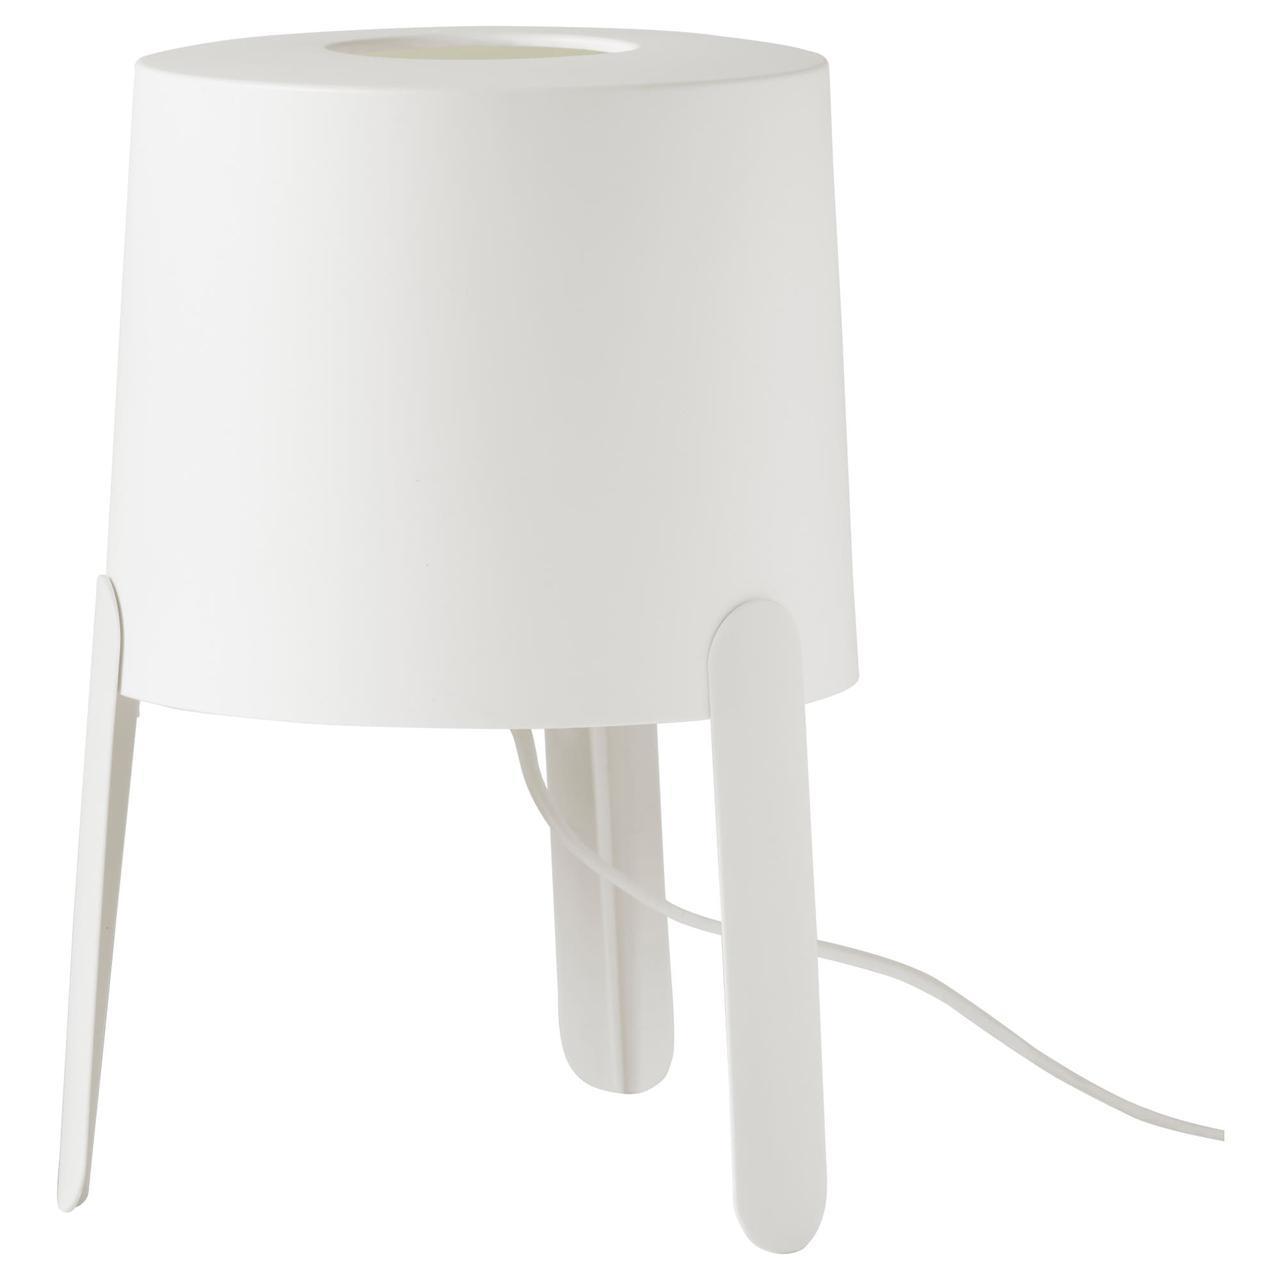 IKEA TVARS (203.561.36) Настольная лампа белого цвета